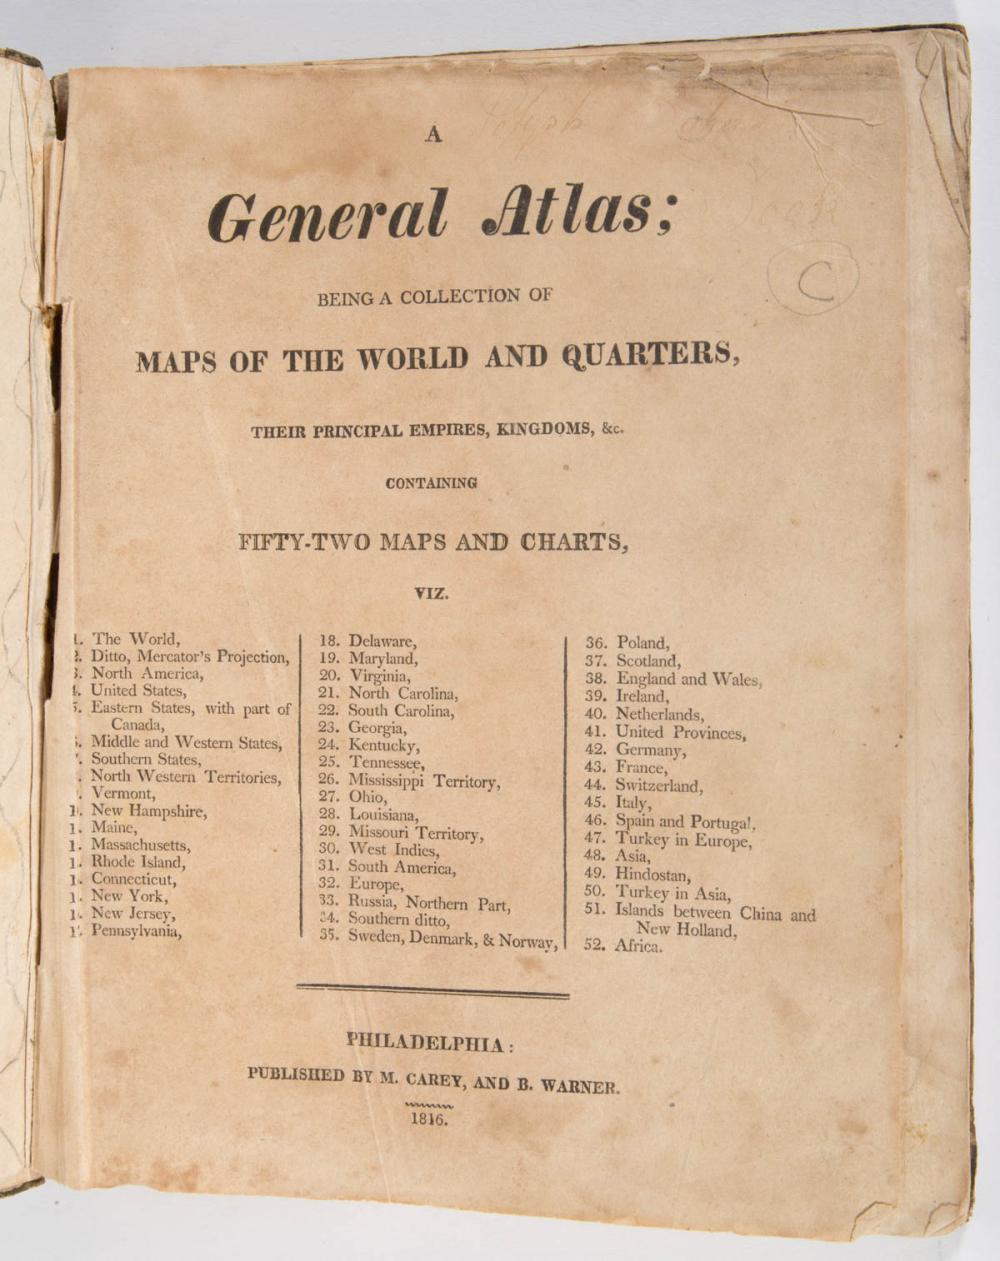 AMERICAN HISTORICAL ATLAS VOLUME